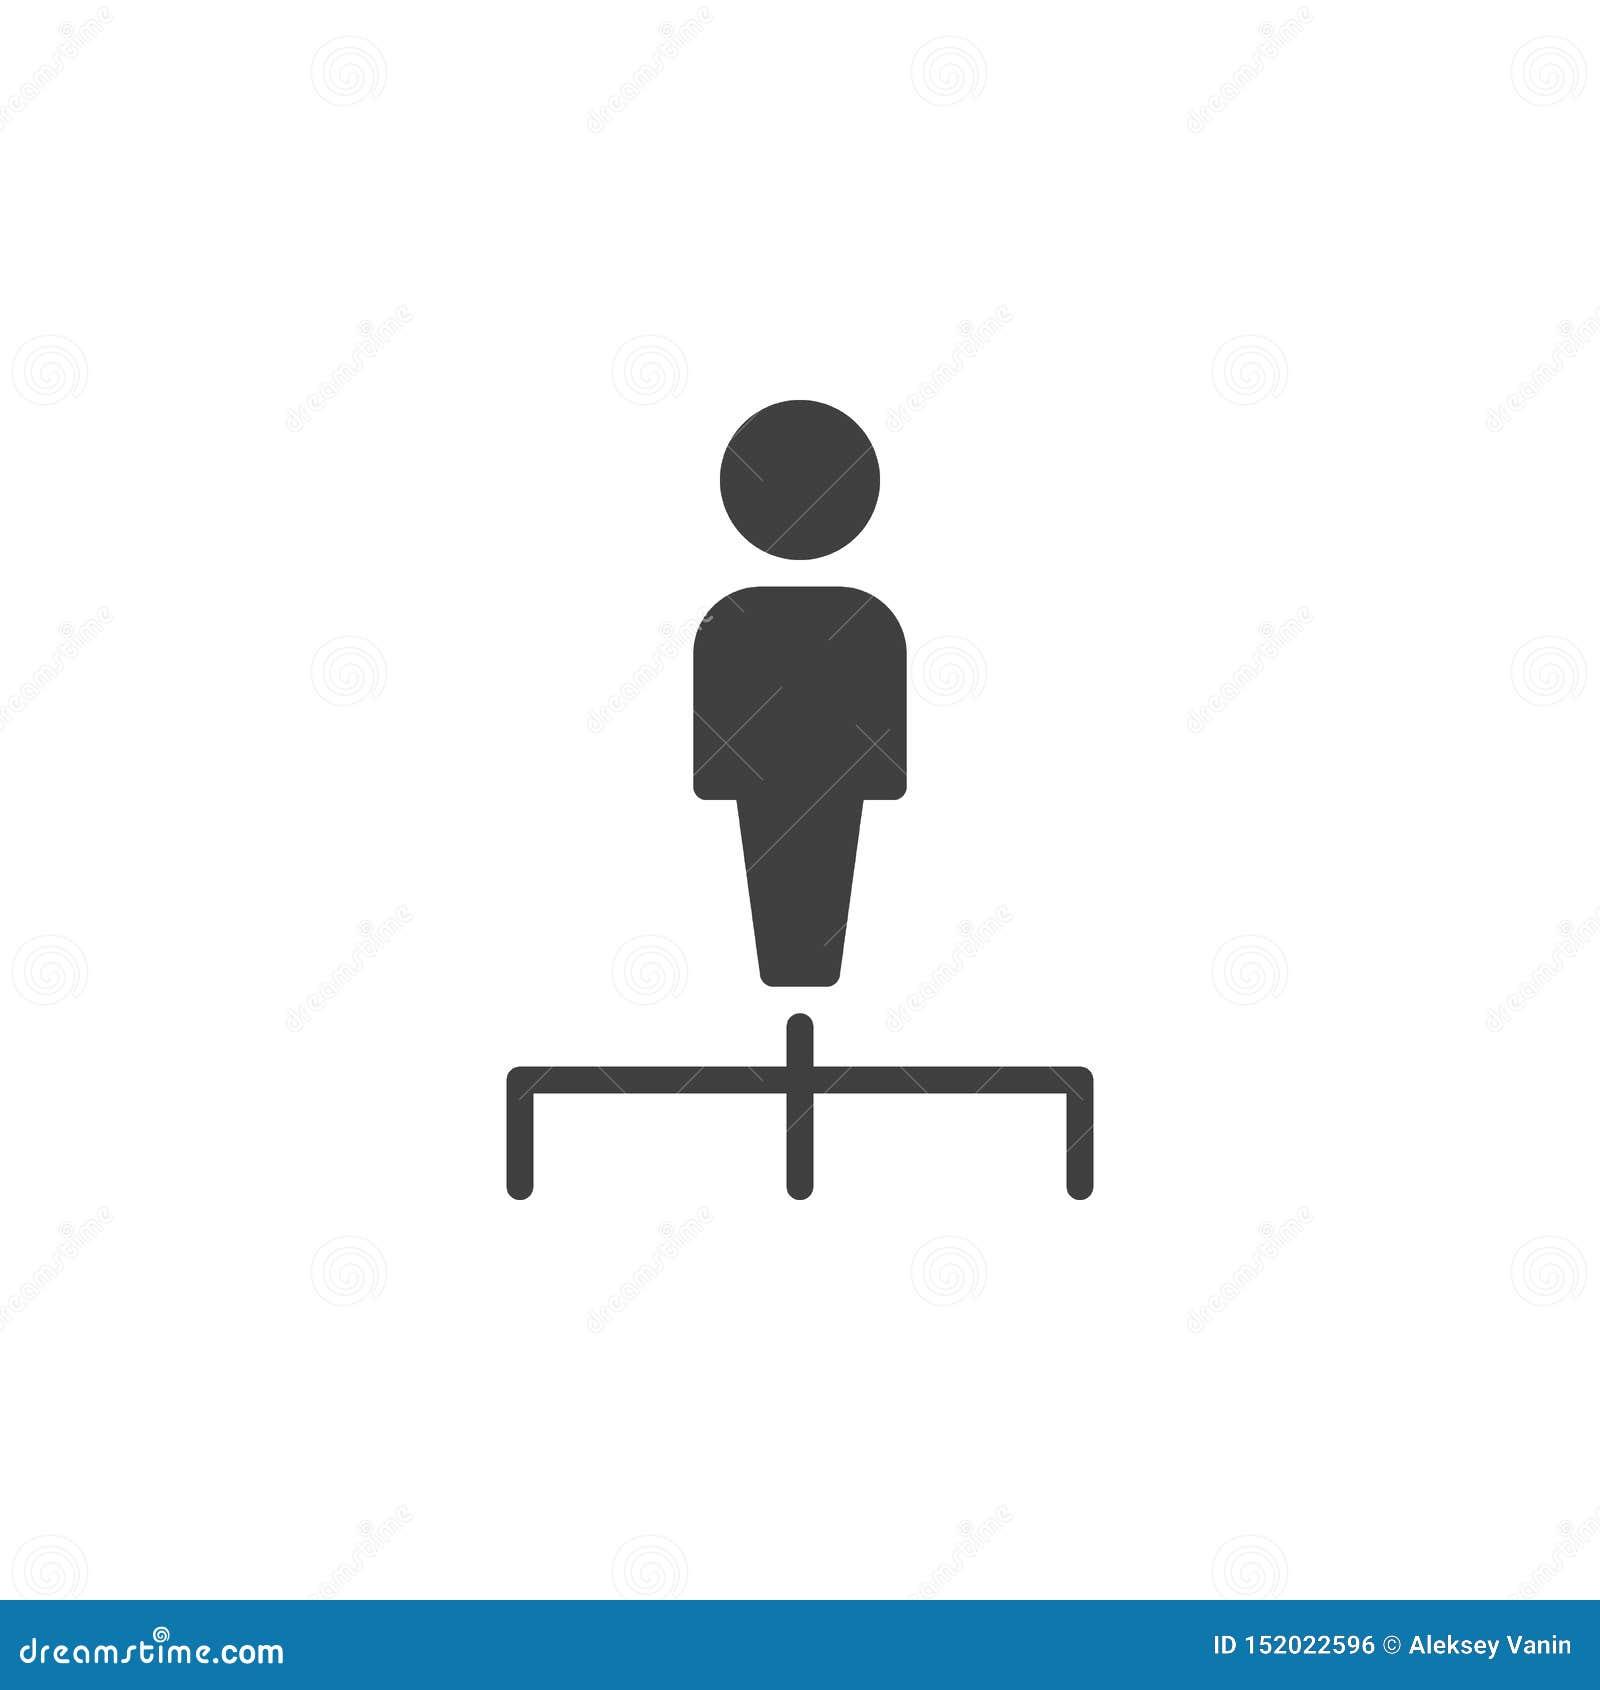 Human resources vector icon